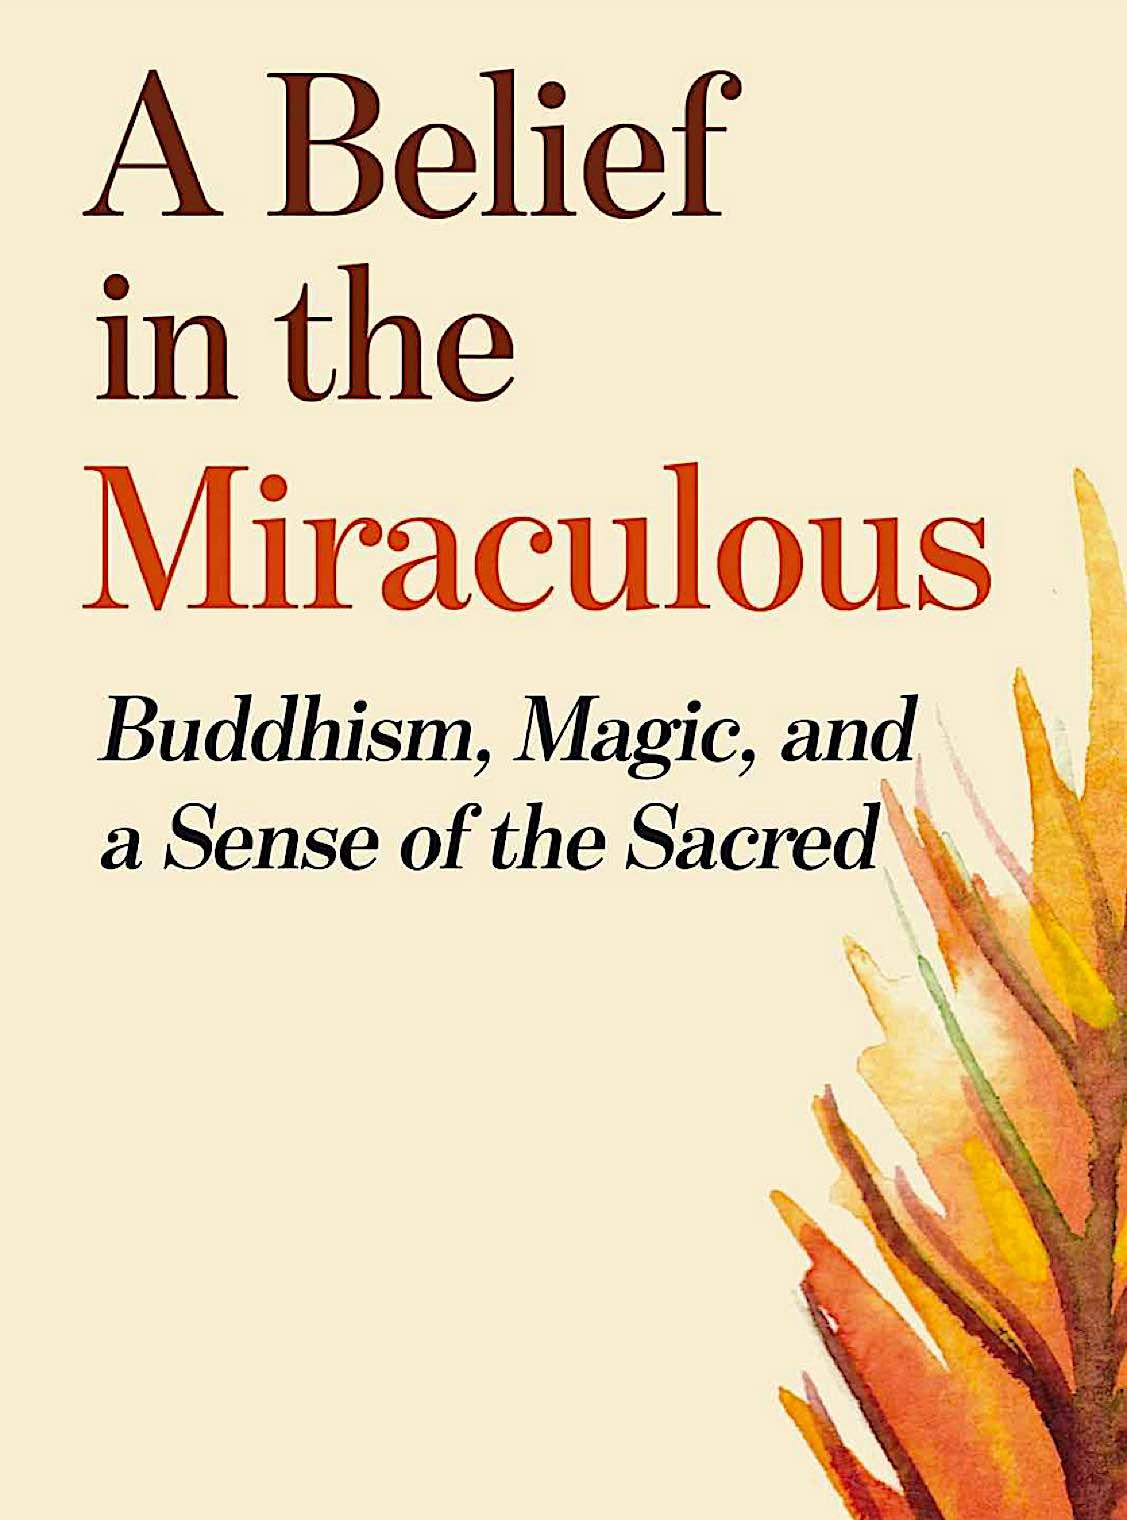 Buddha Weekly A belief in the Miraculous by Jason Espada on Amazon Buddhism